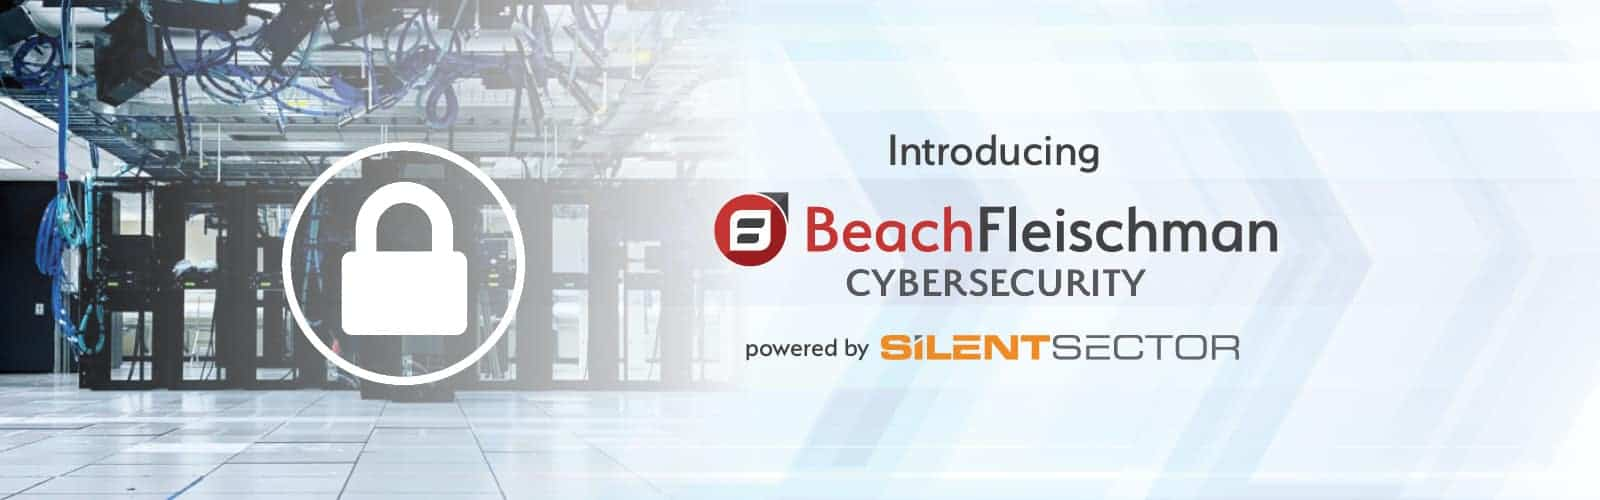 BeachFleischman Cybersecurity